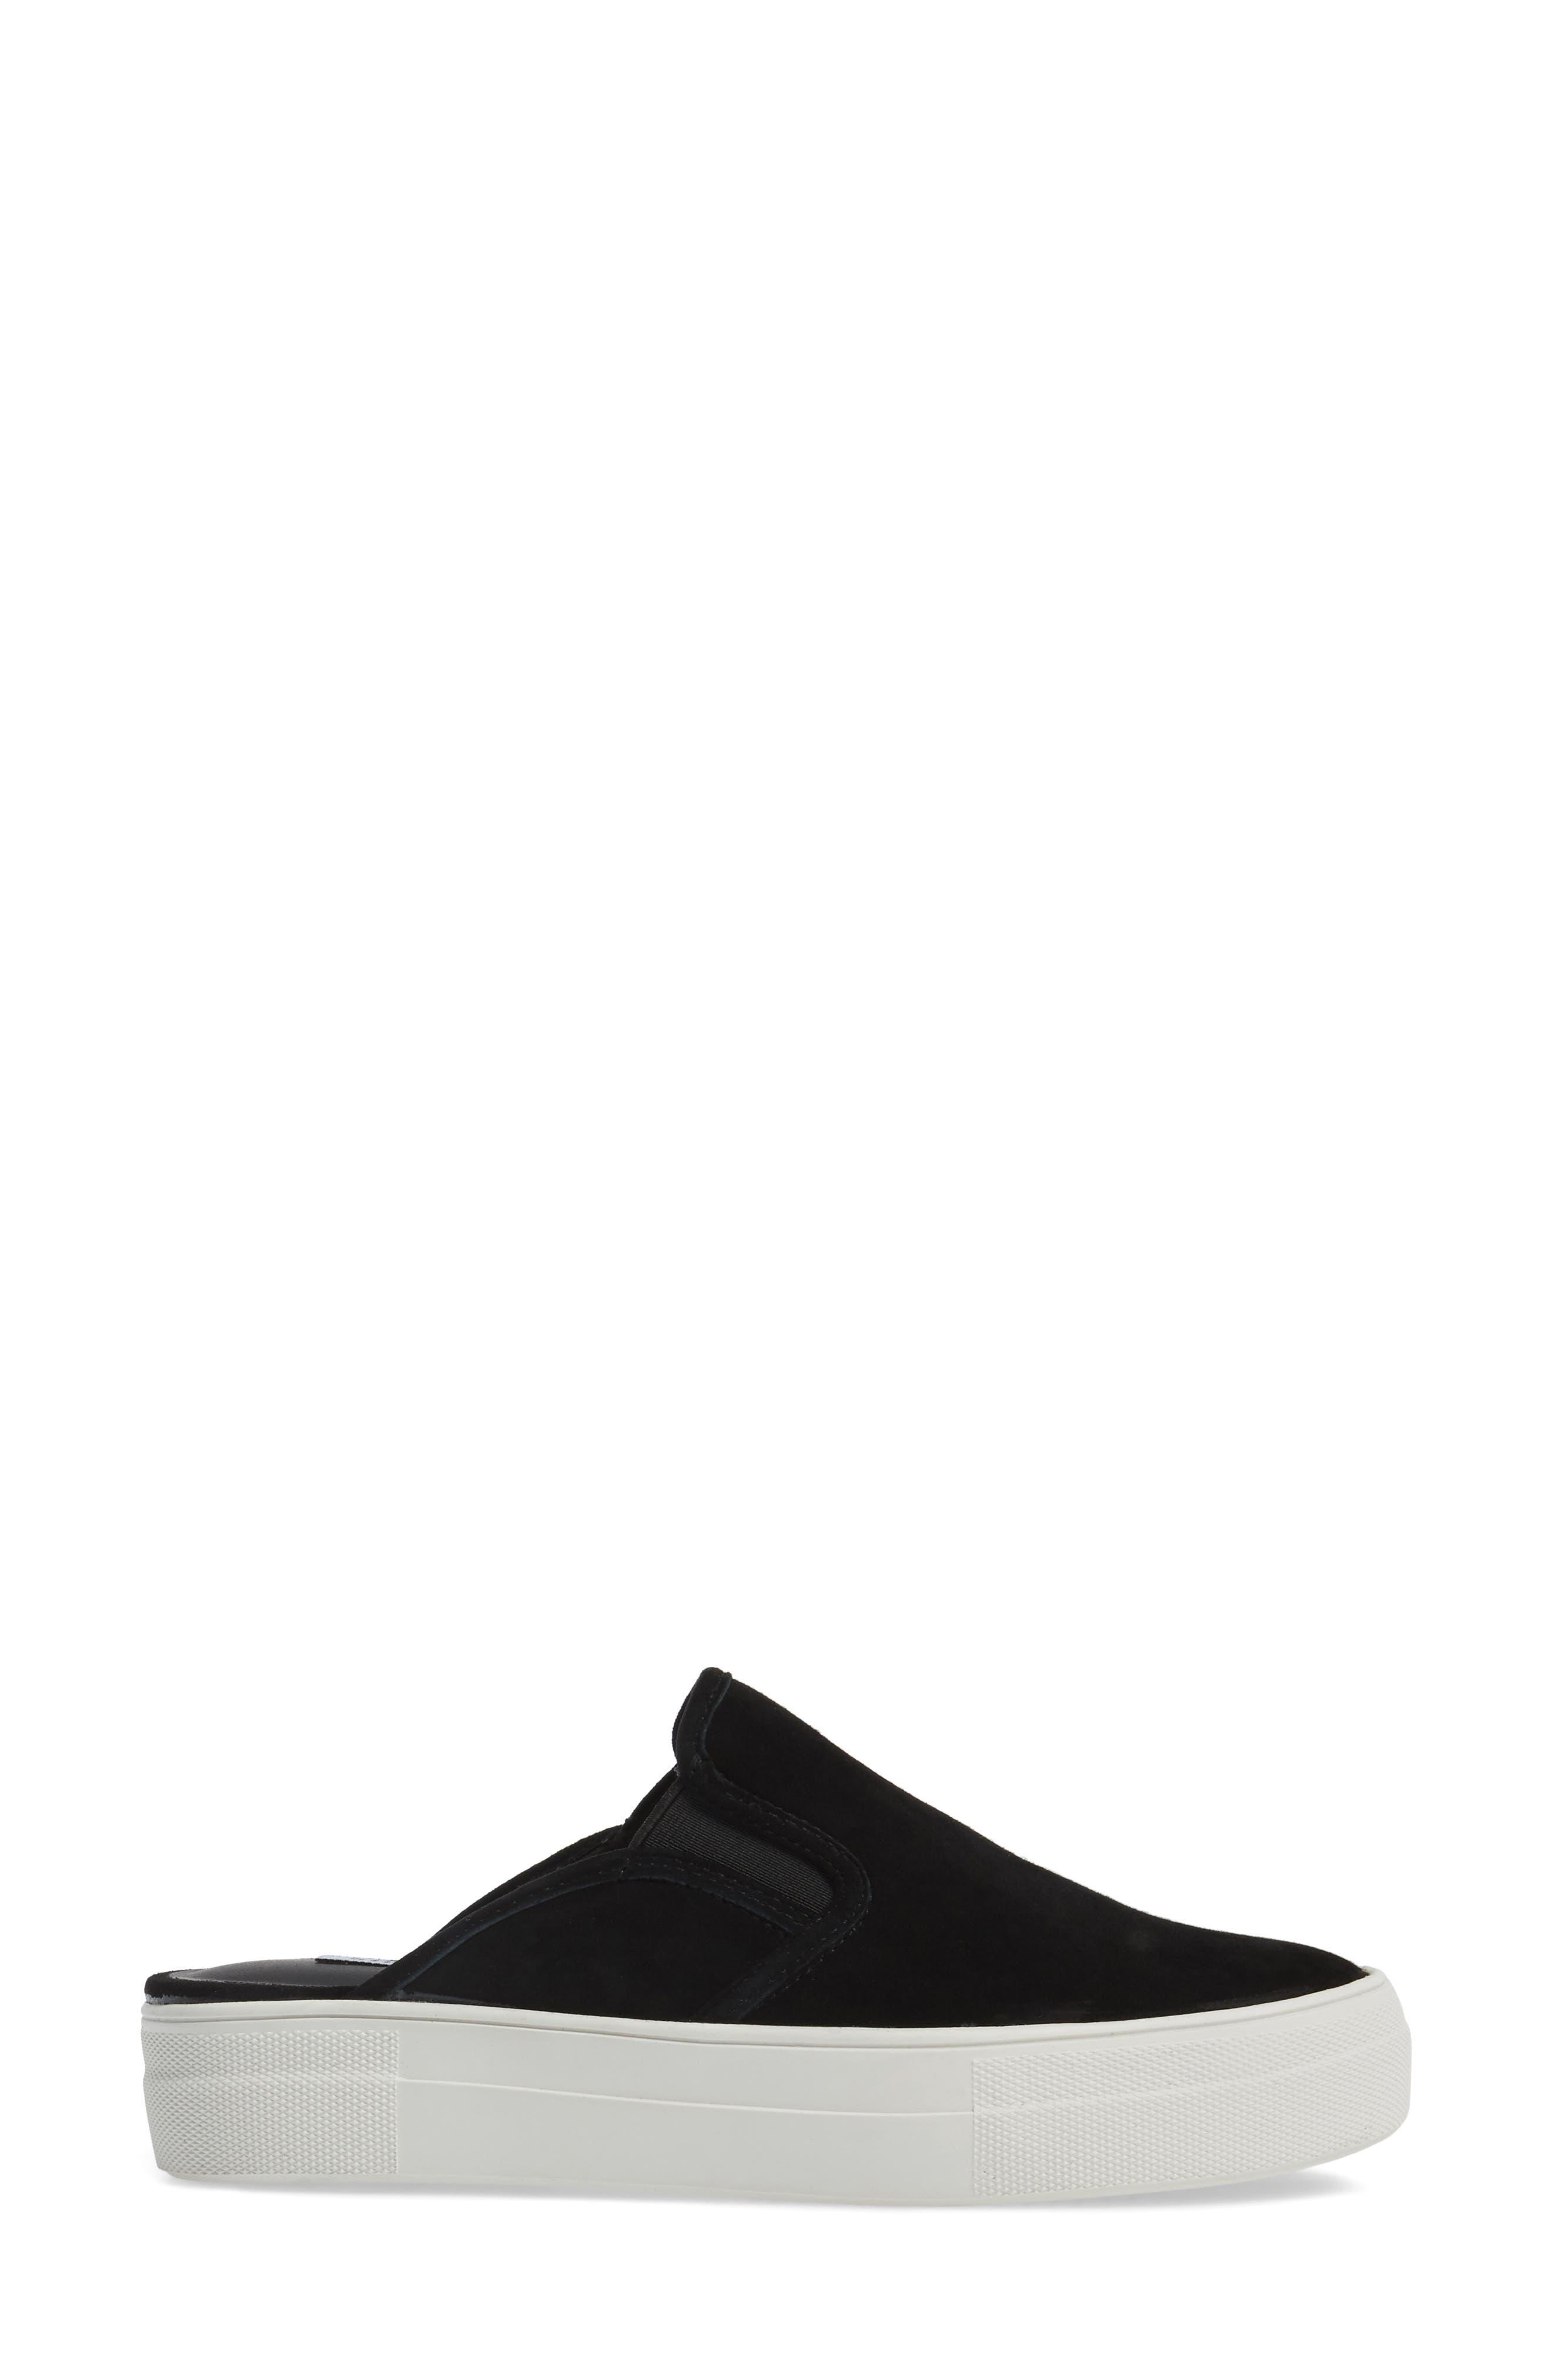 Glenda Sneaker Mule,                             Alternate thumbnail 3, color,                             006